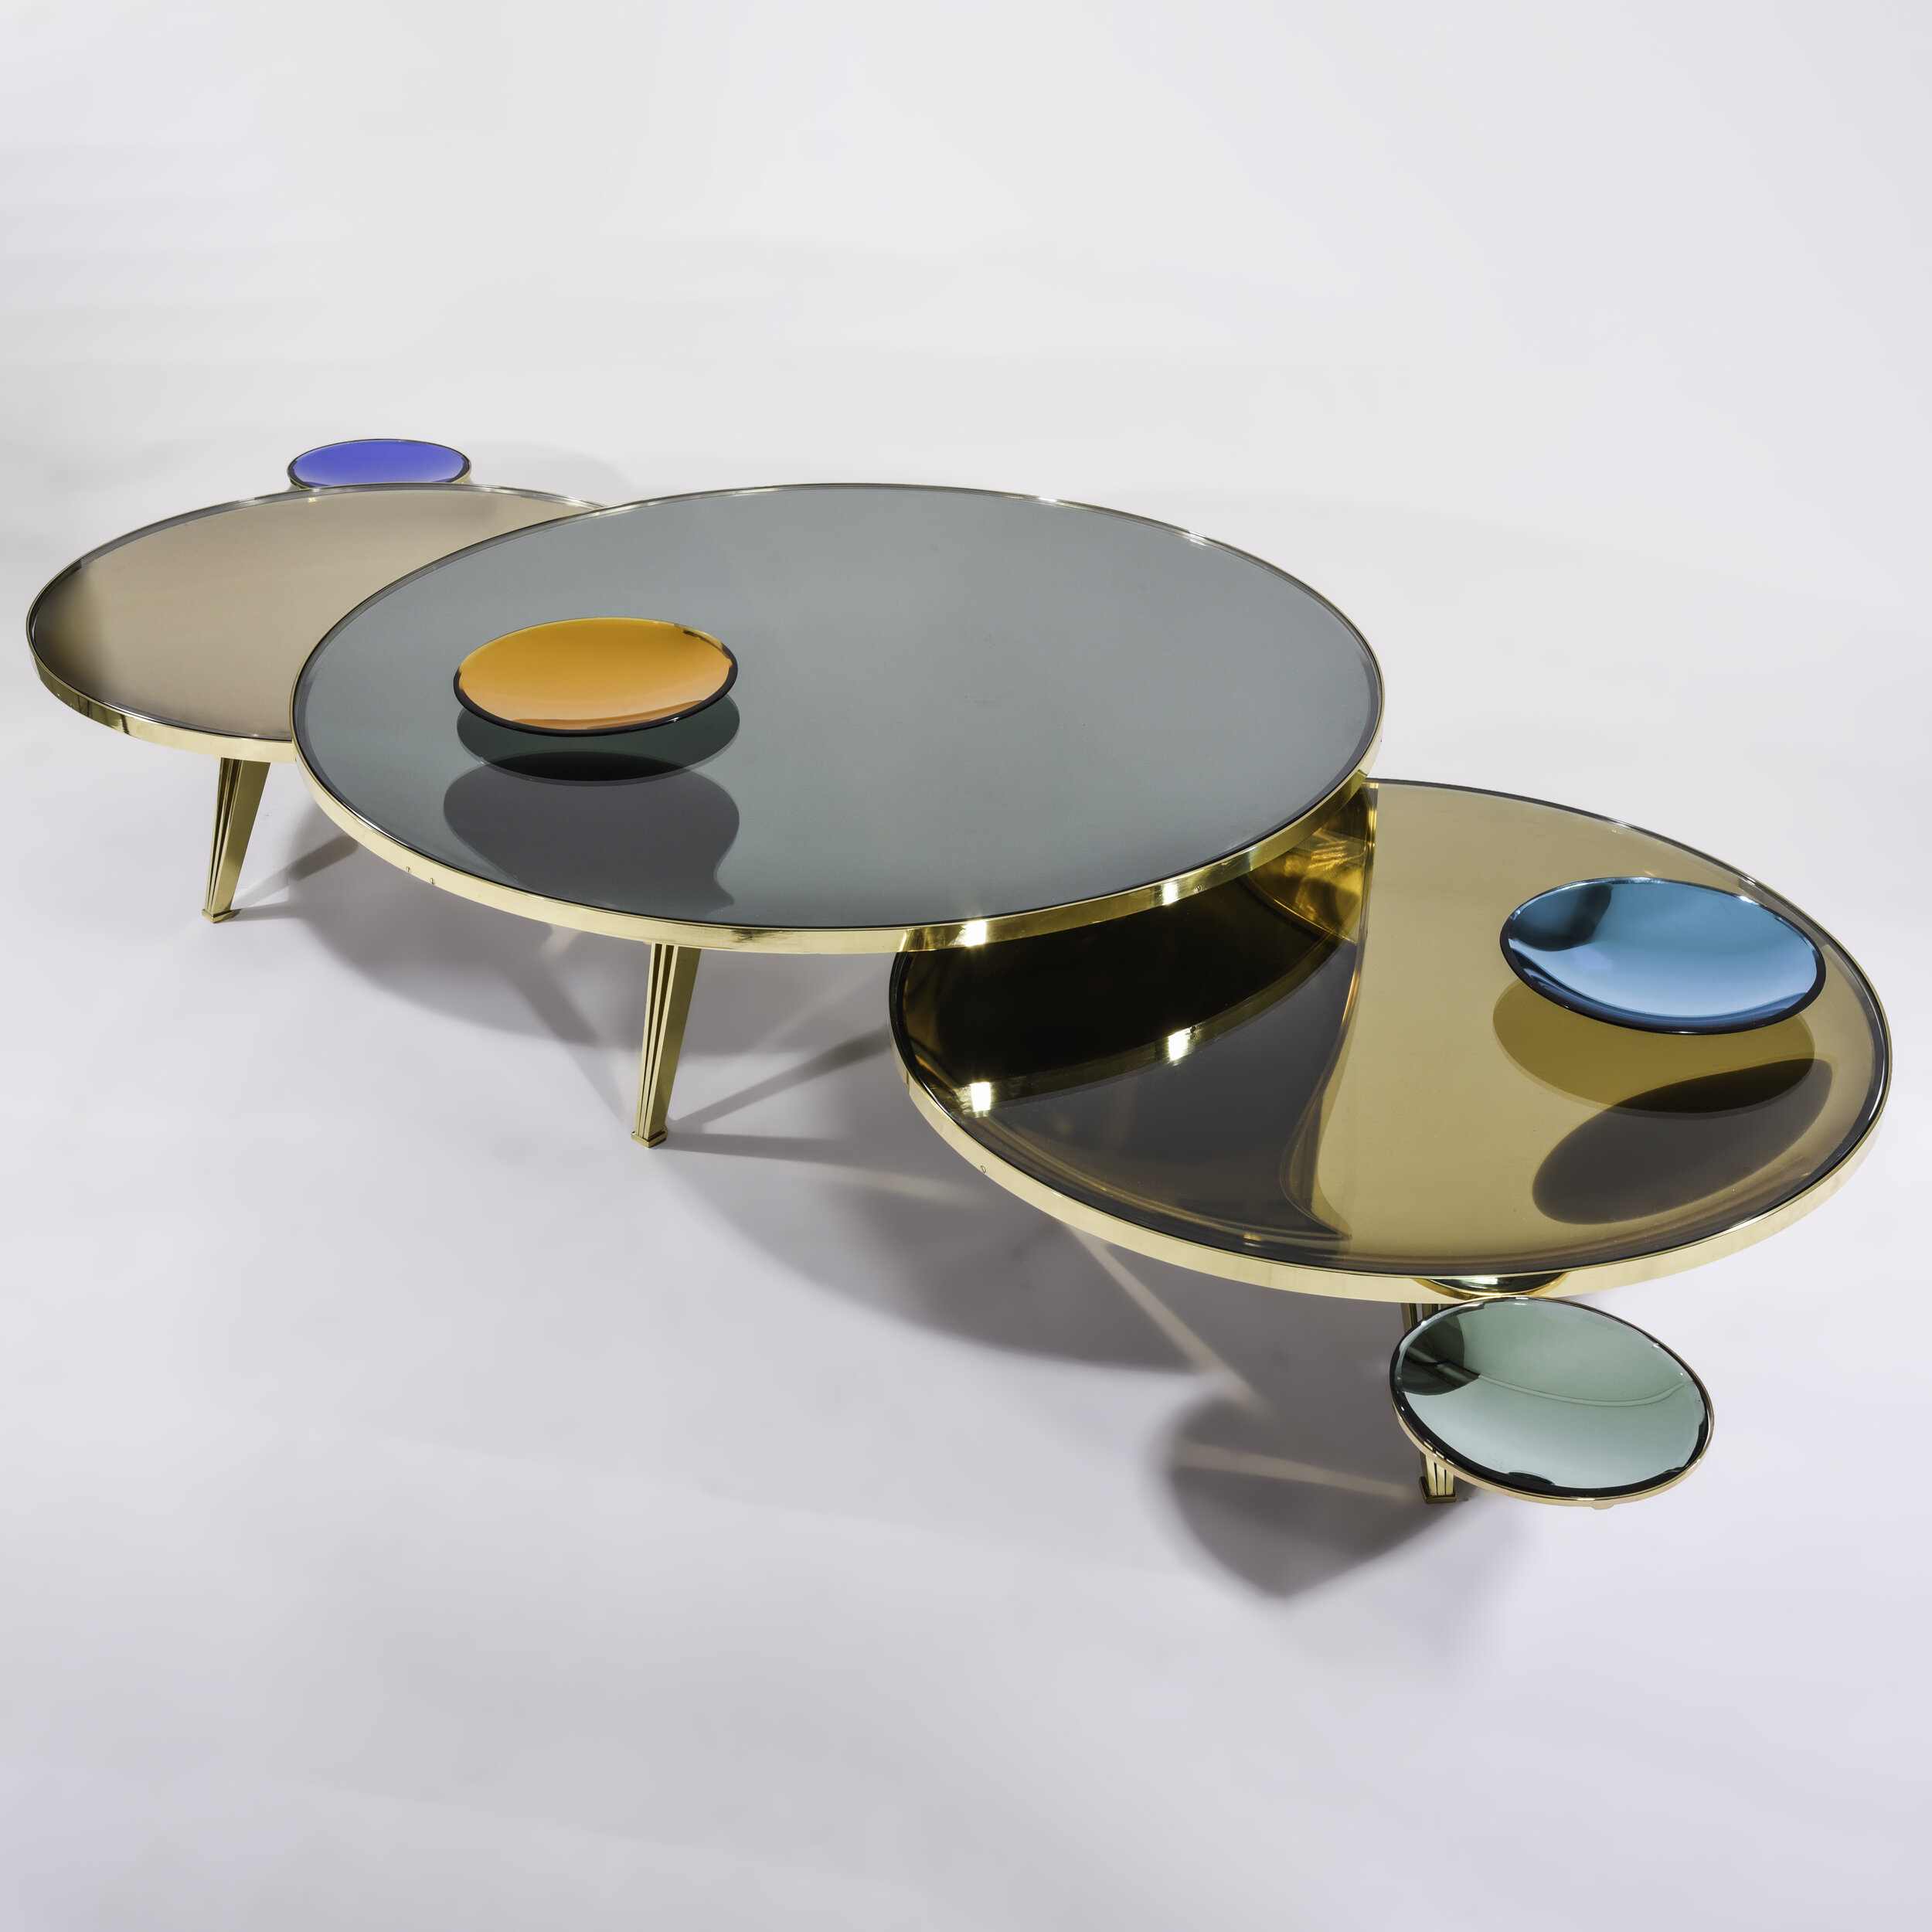 riflesso coffee tables set of three gaspare asaro italian modern italian mid century modern furniture and lighting new york ny